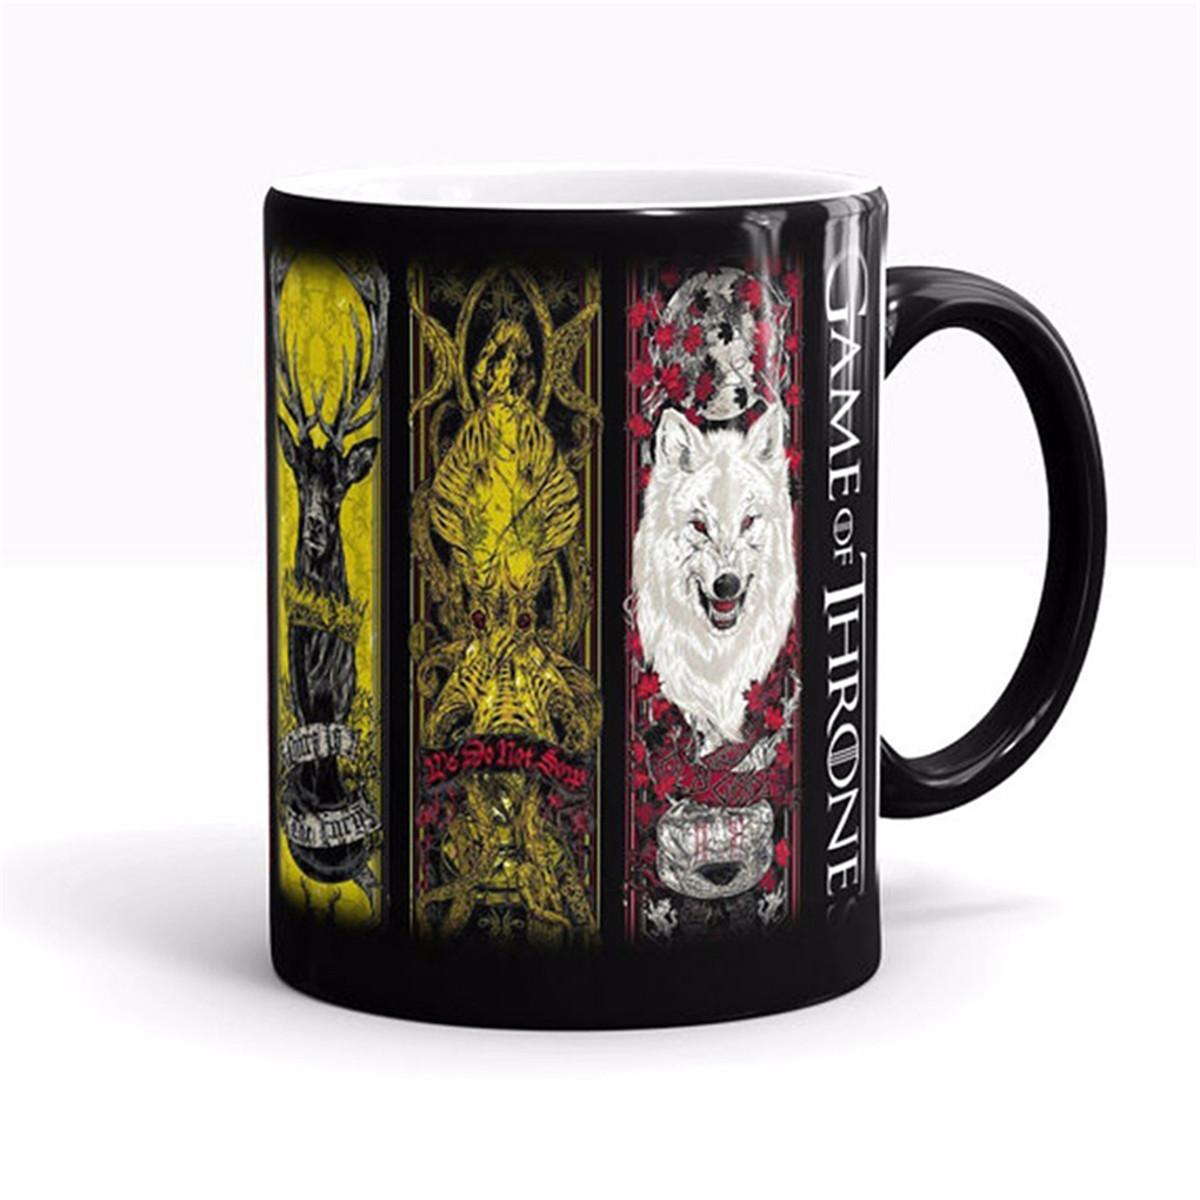 Game of Thrones Heat Sensitive Color Changing Ceramic Mug 11034425